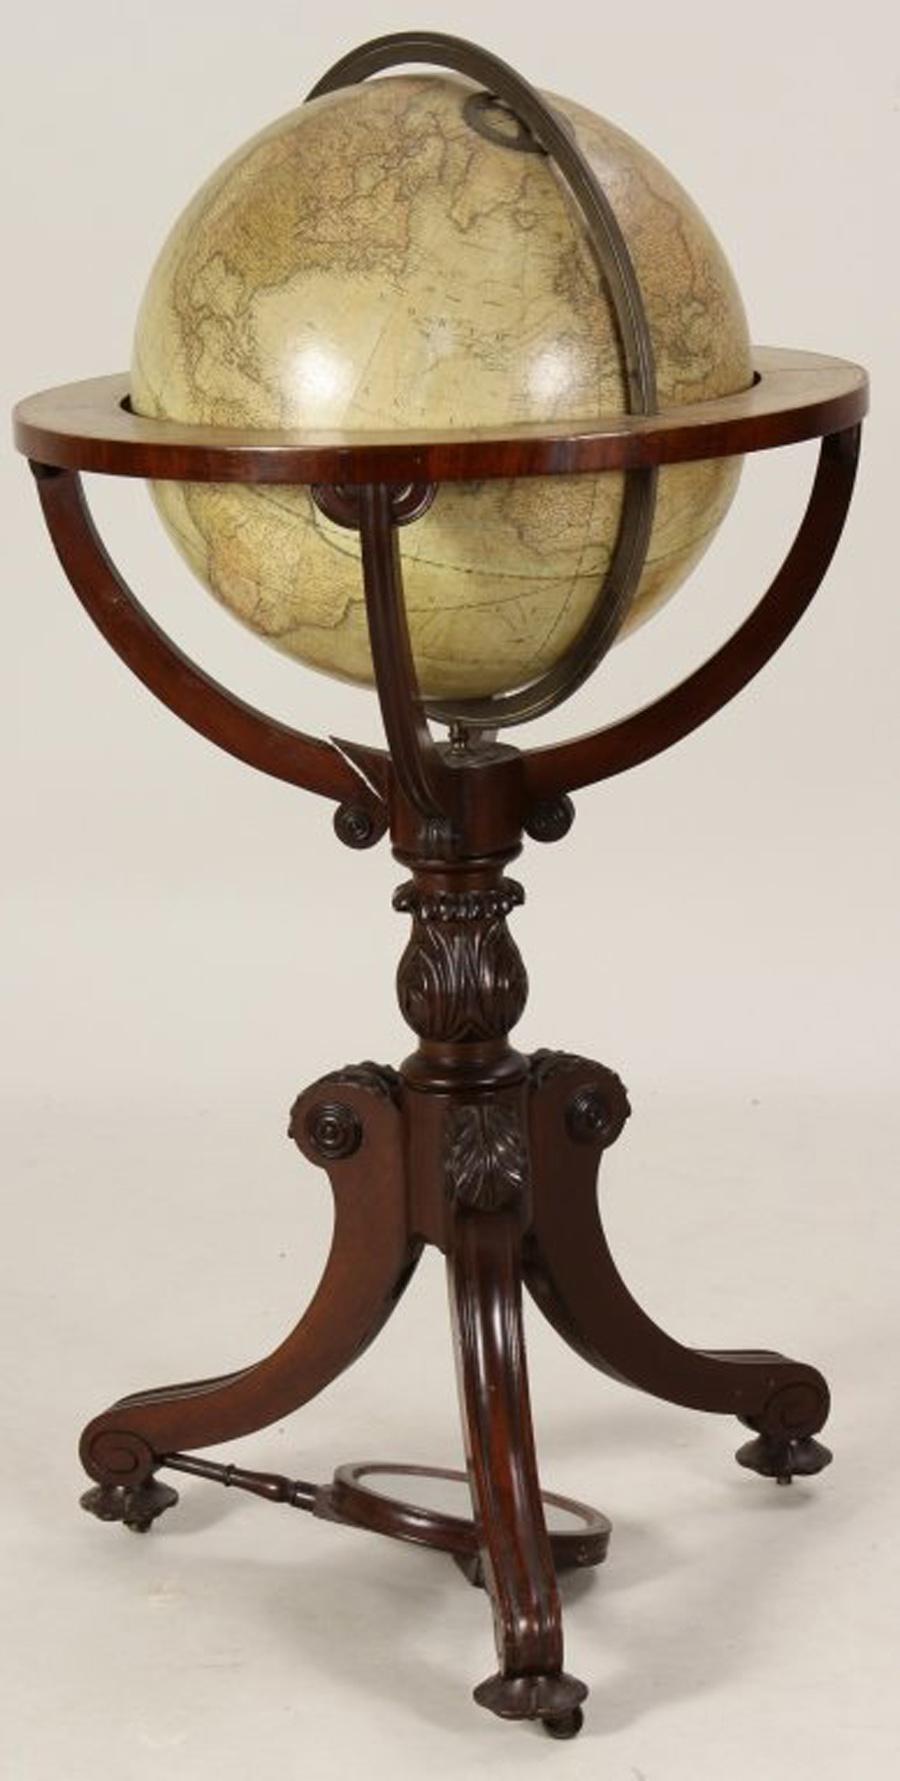 Litchfield - globe